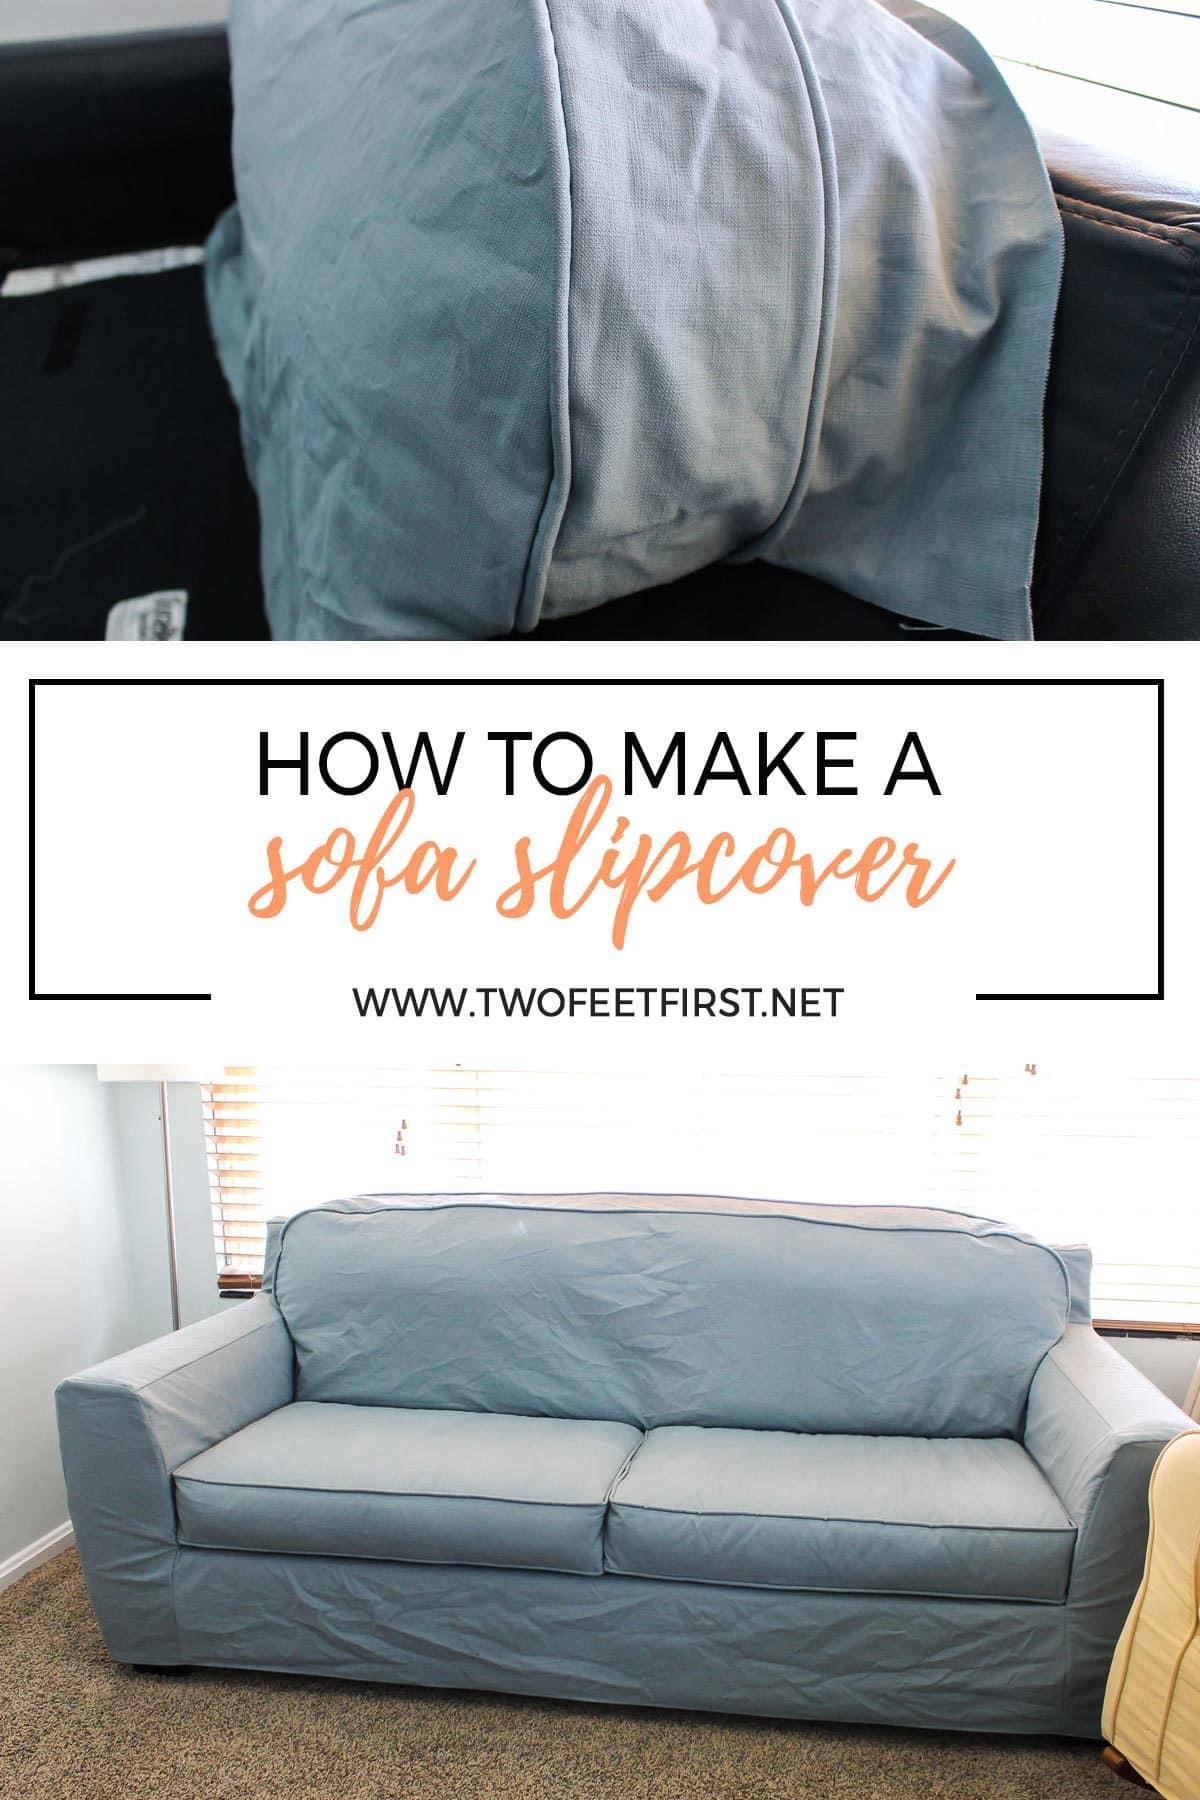 how to make a sofa slipcover